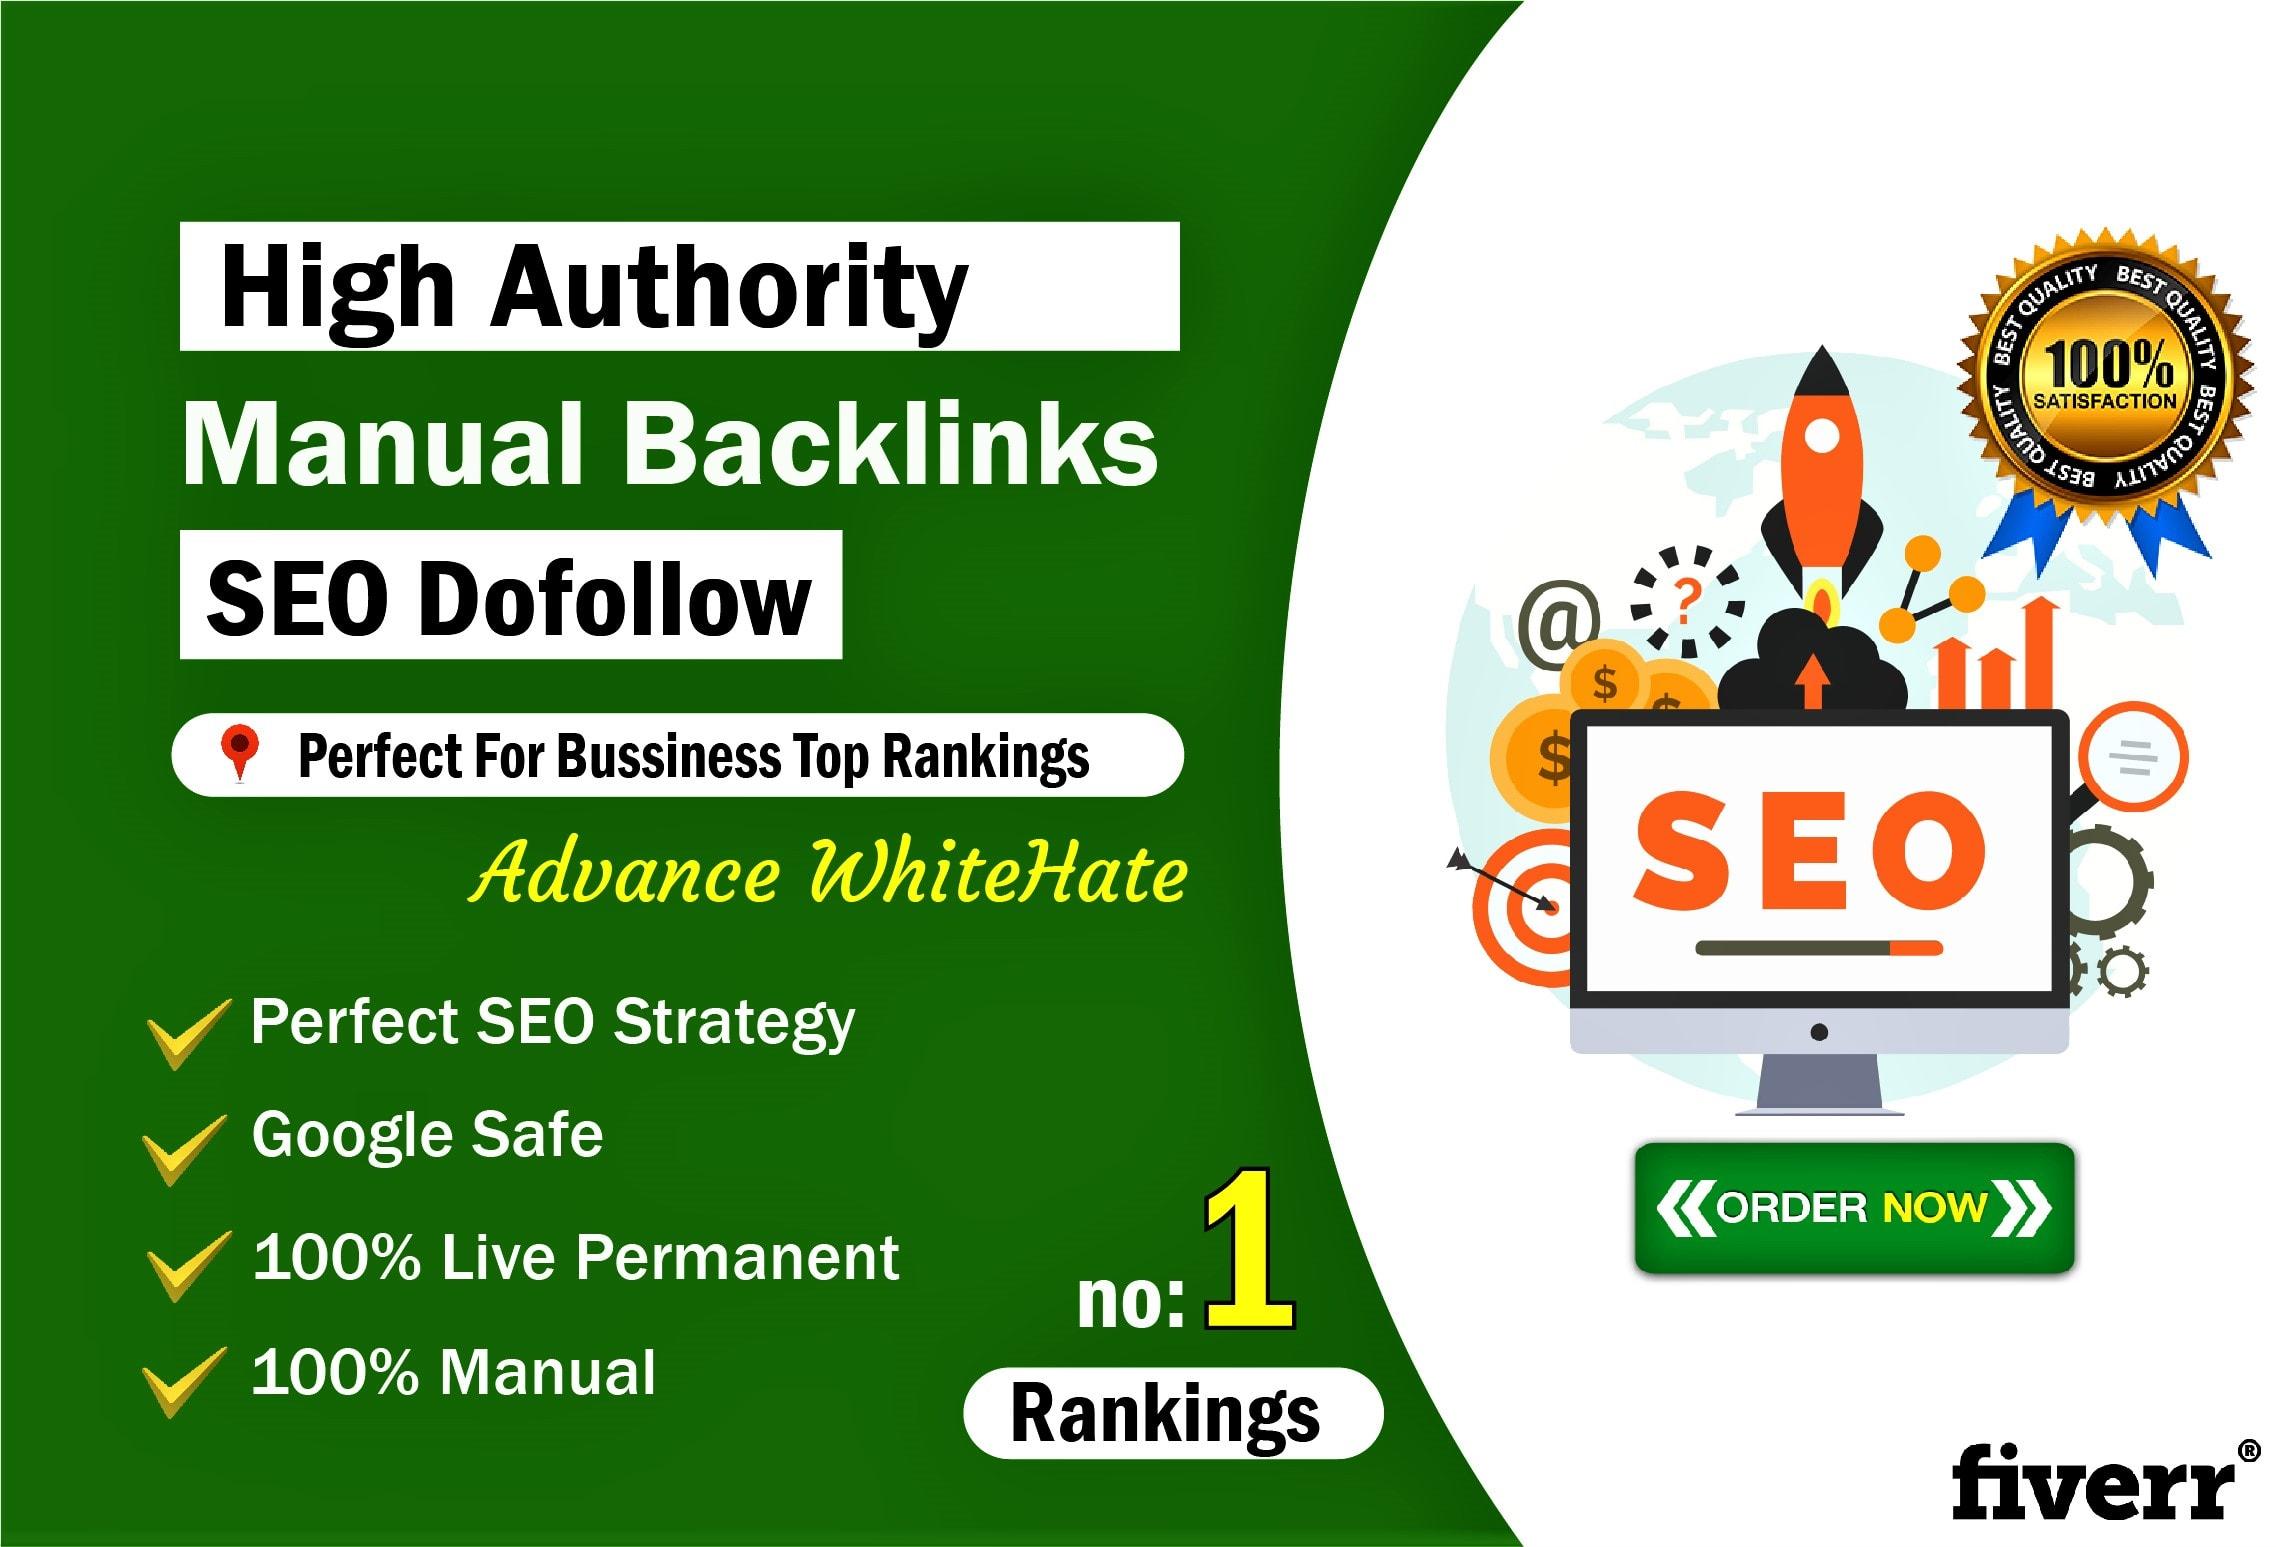 Do high authority manual 30 SEO dofollow backlinks in google rankings